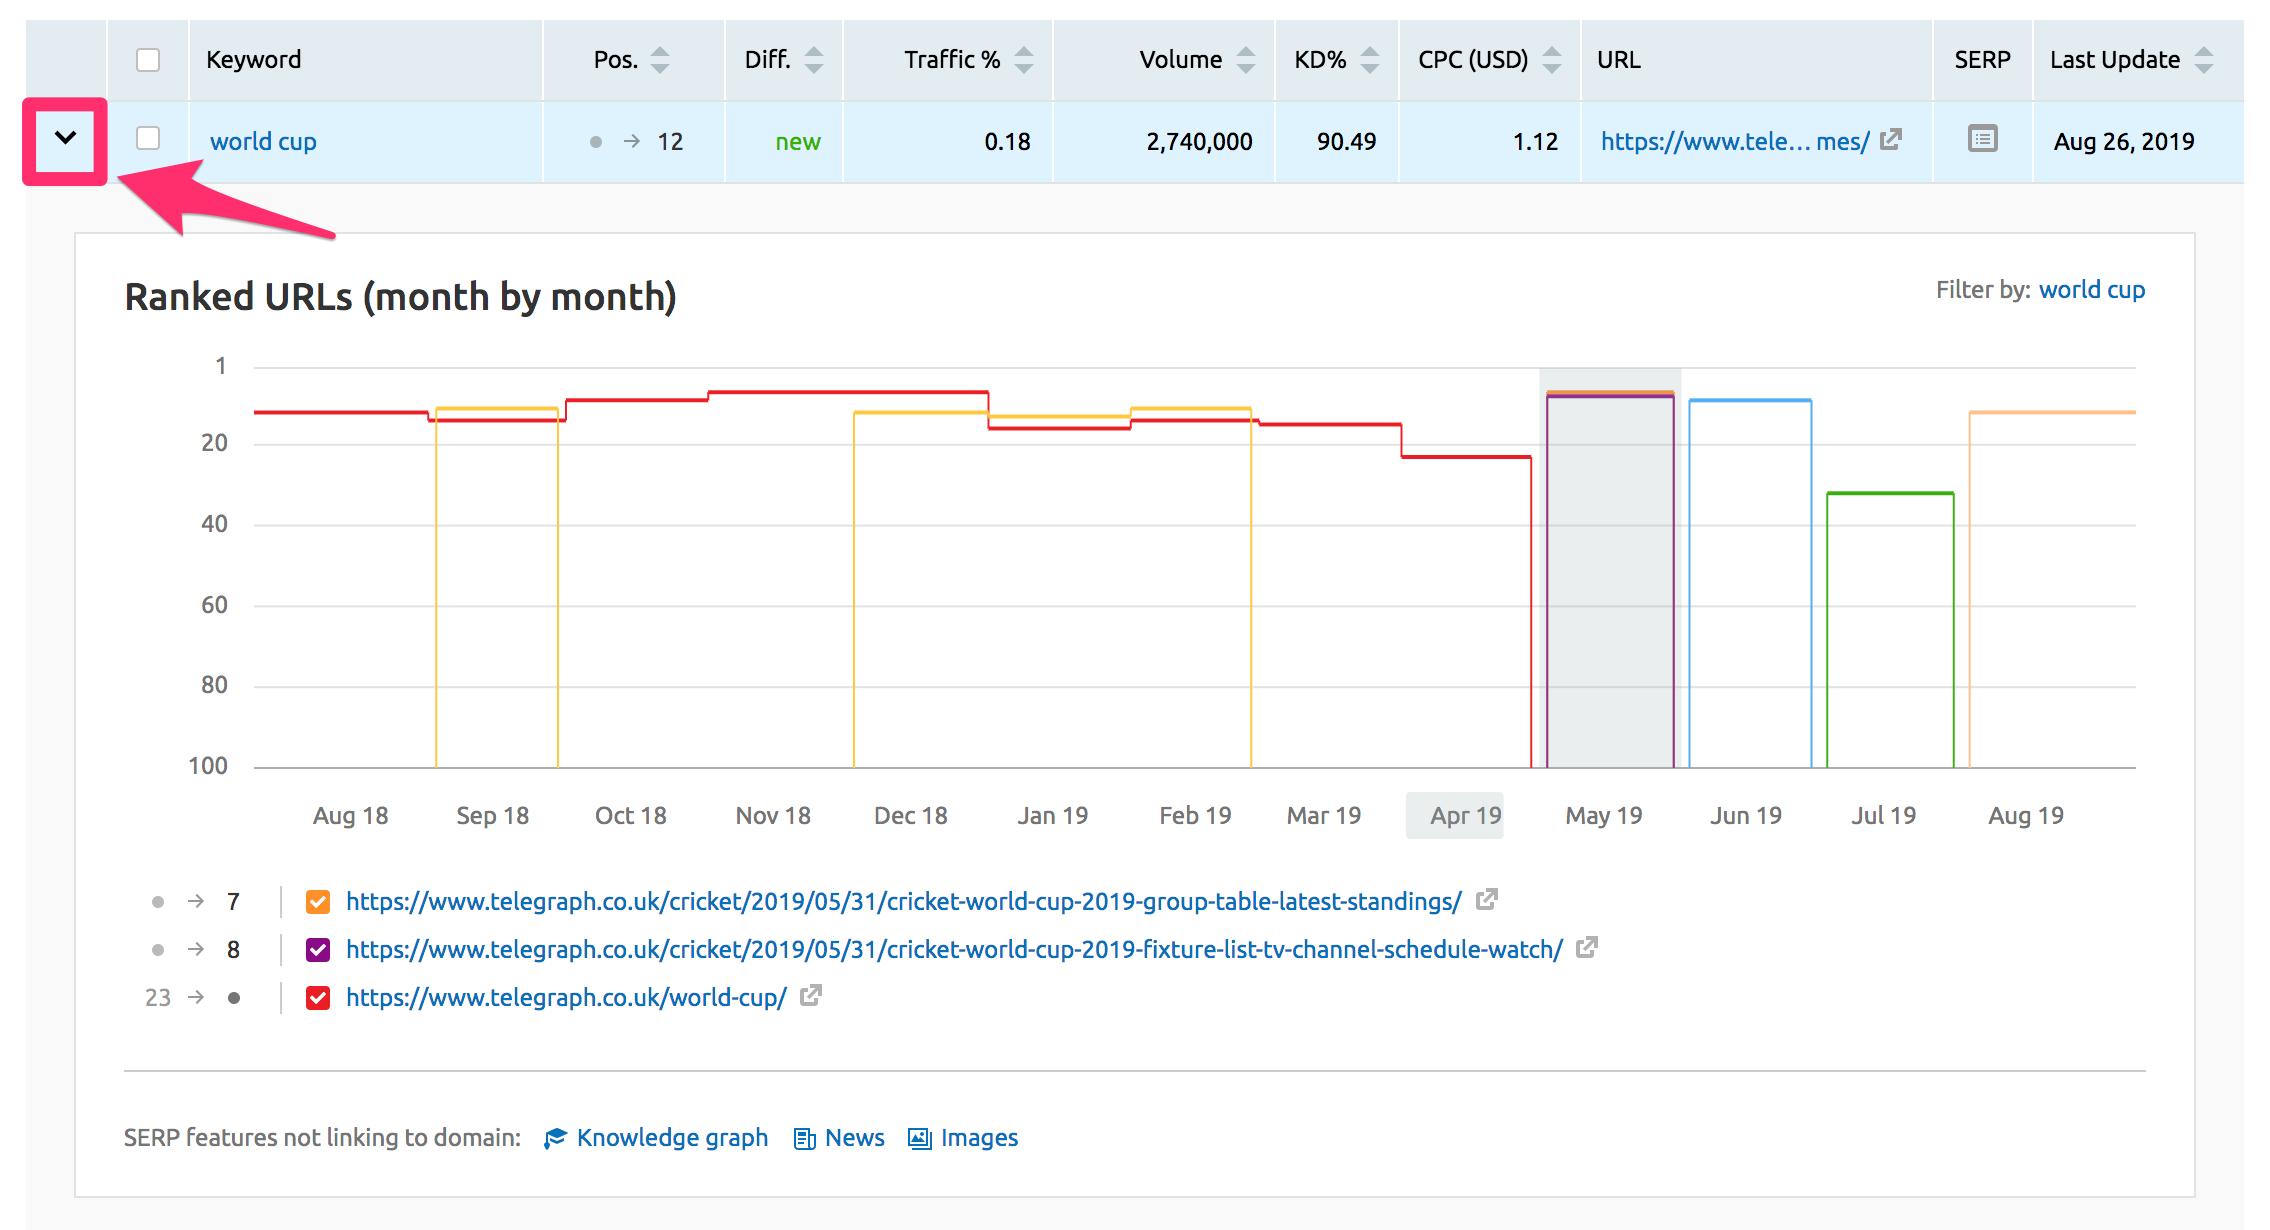 URL ranking history for a keyword